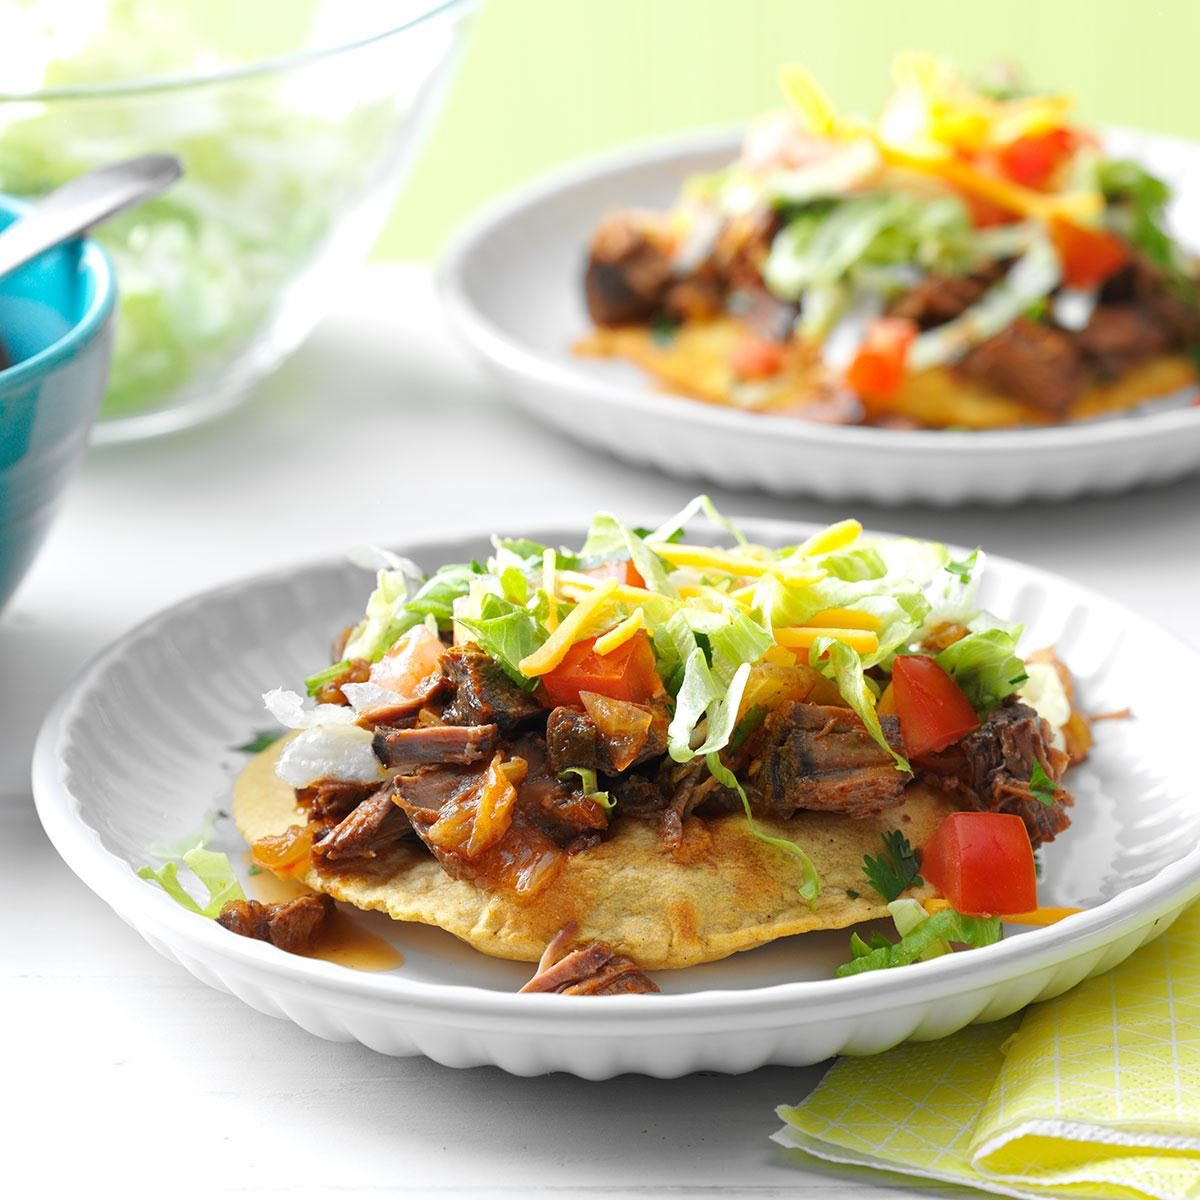 Slow Cooker Beef Tostadas Recipe | Taste of Home